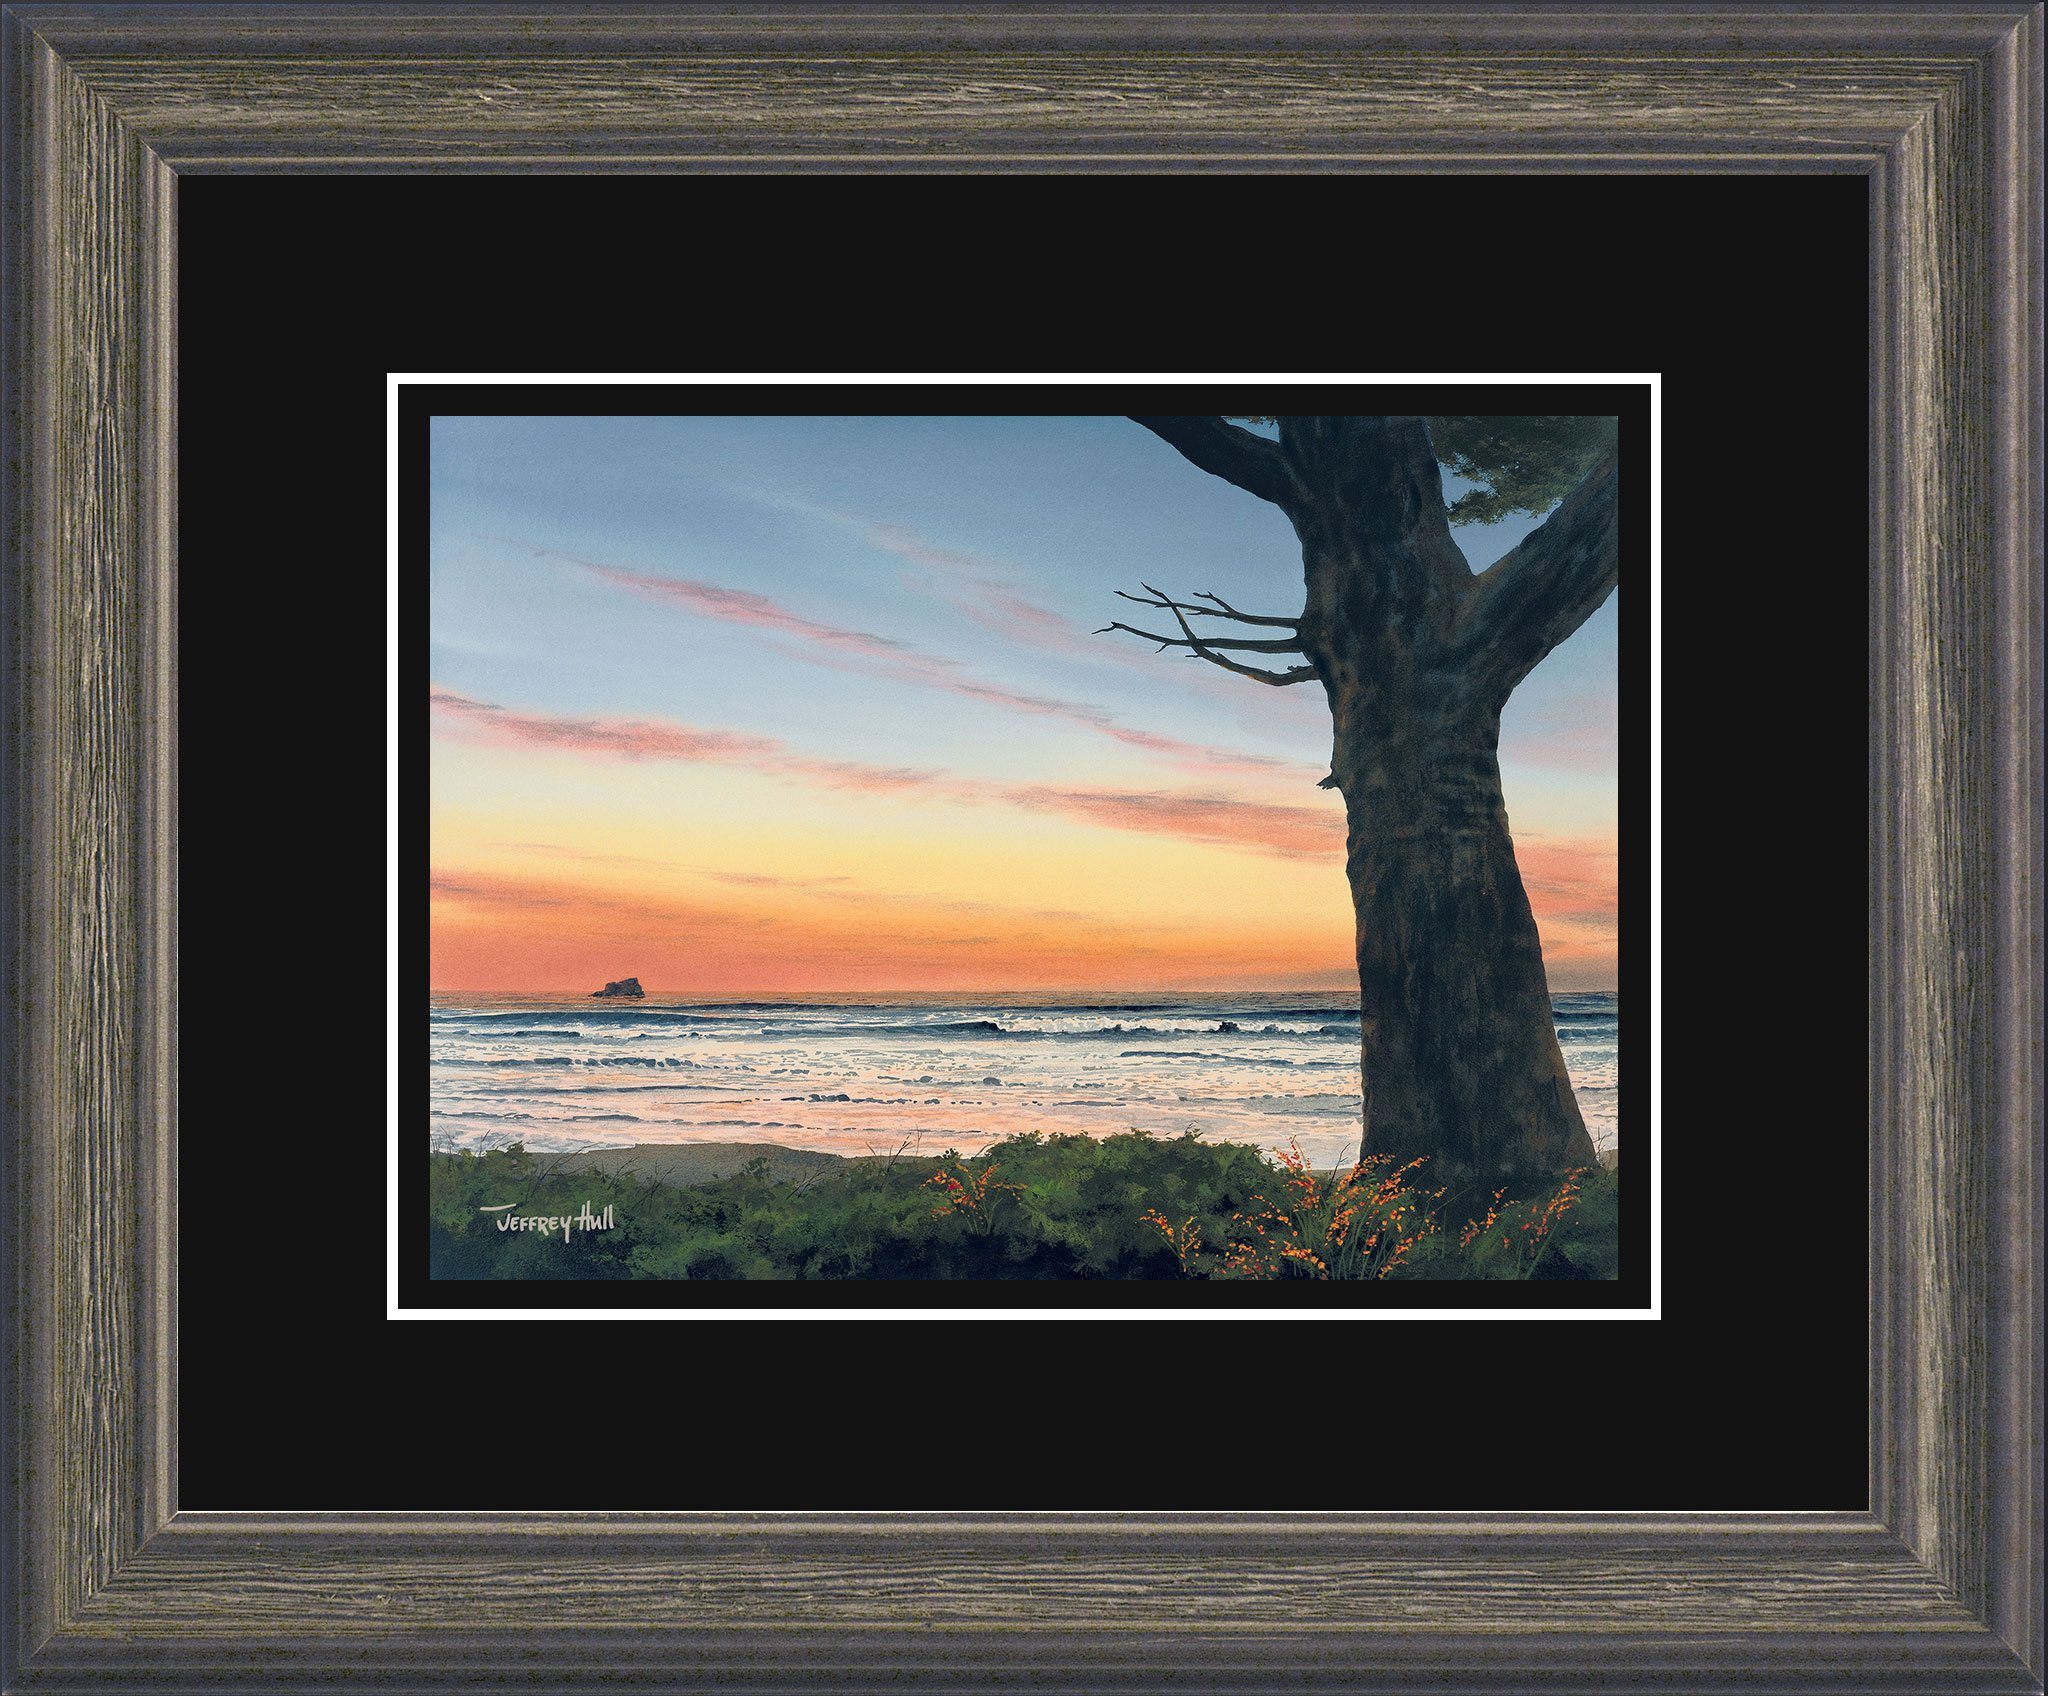 Sunset-Overlook-Mini-Cascade-Jet-Black-4-Website-2021